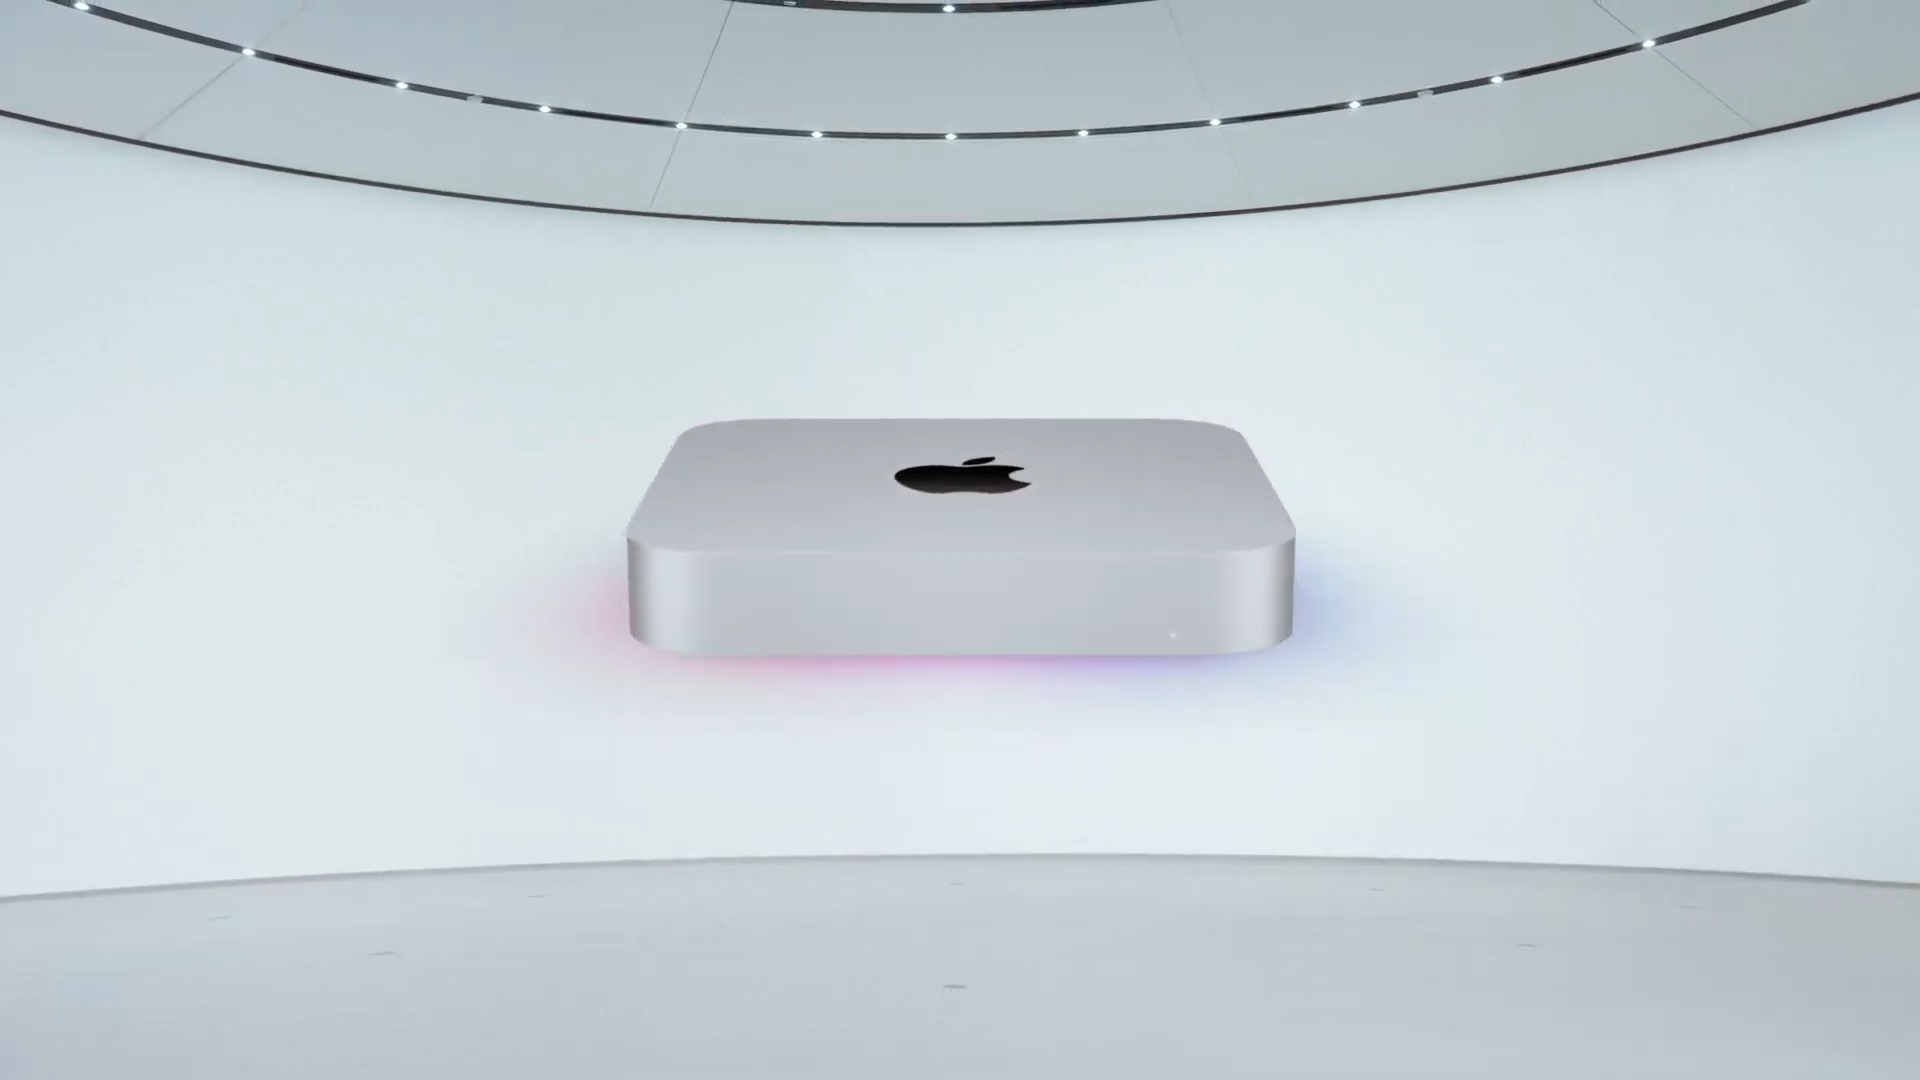 apple m1 mac mini 10 gigabit ethernet